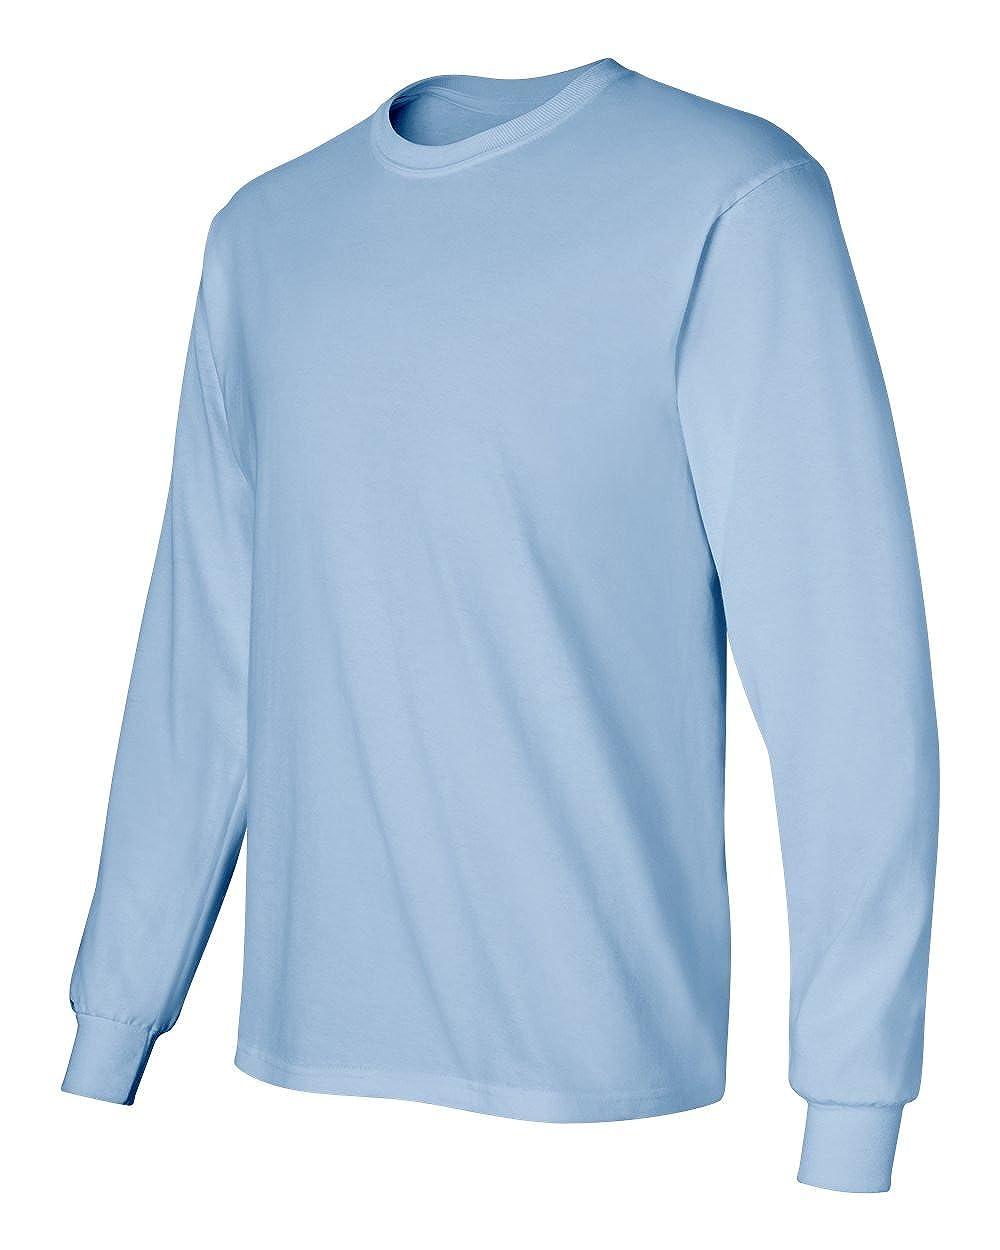 Cotton 6 oz Long-Sleeve T-Shirt G240